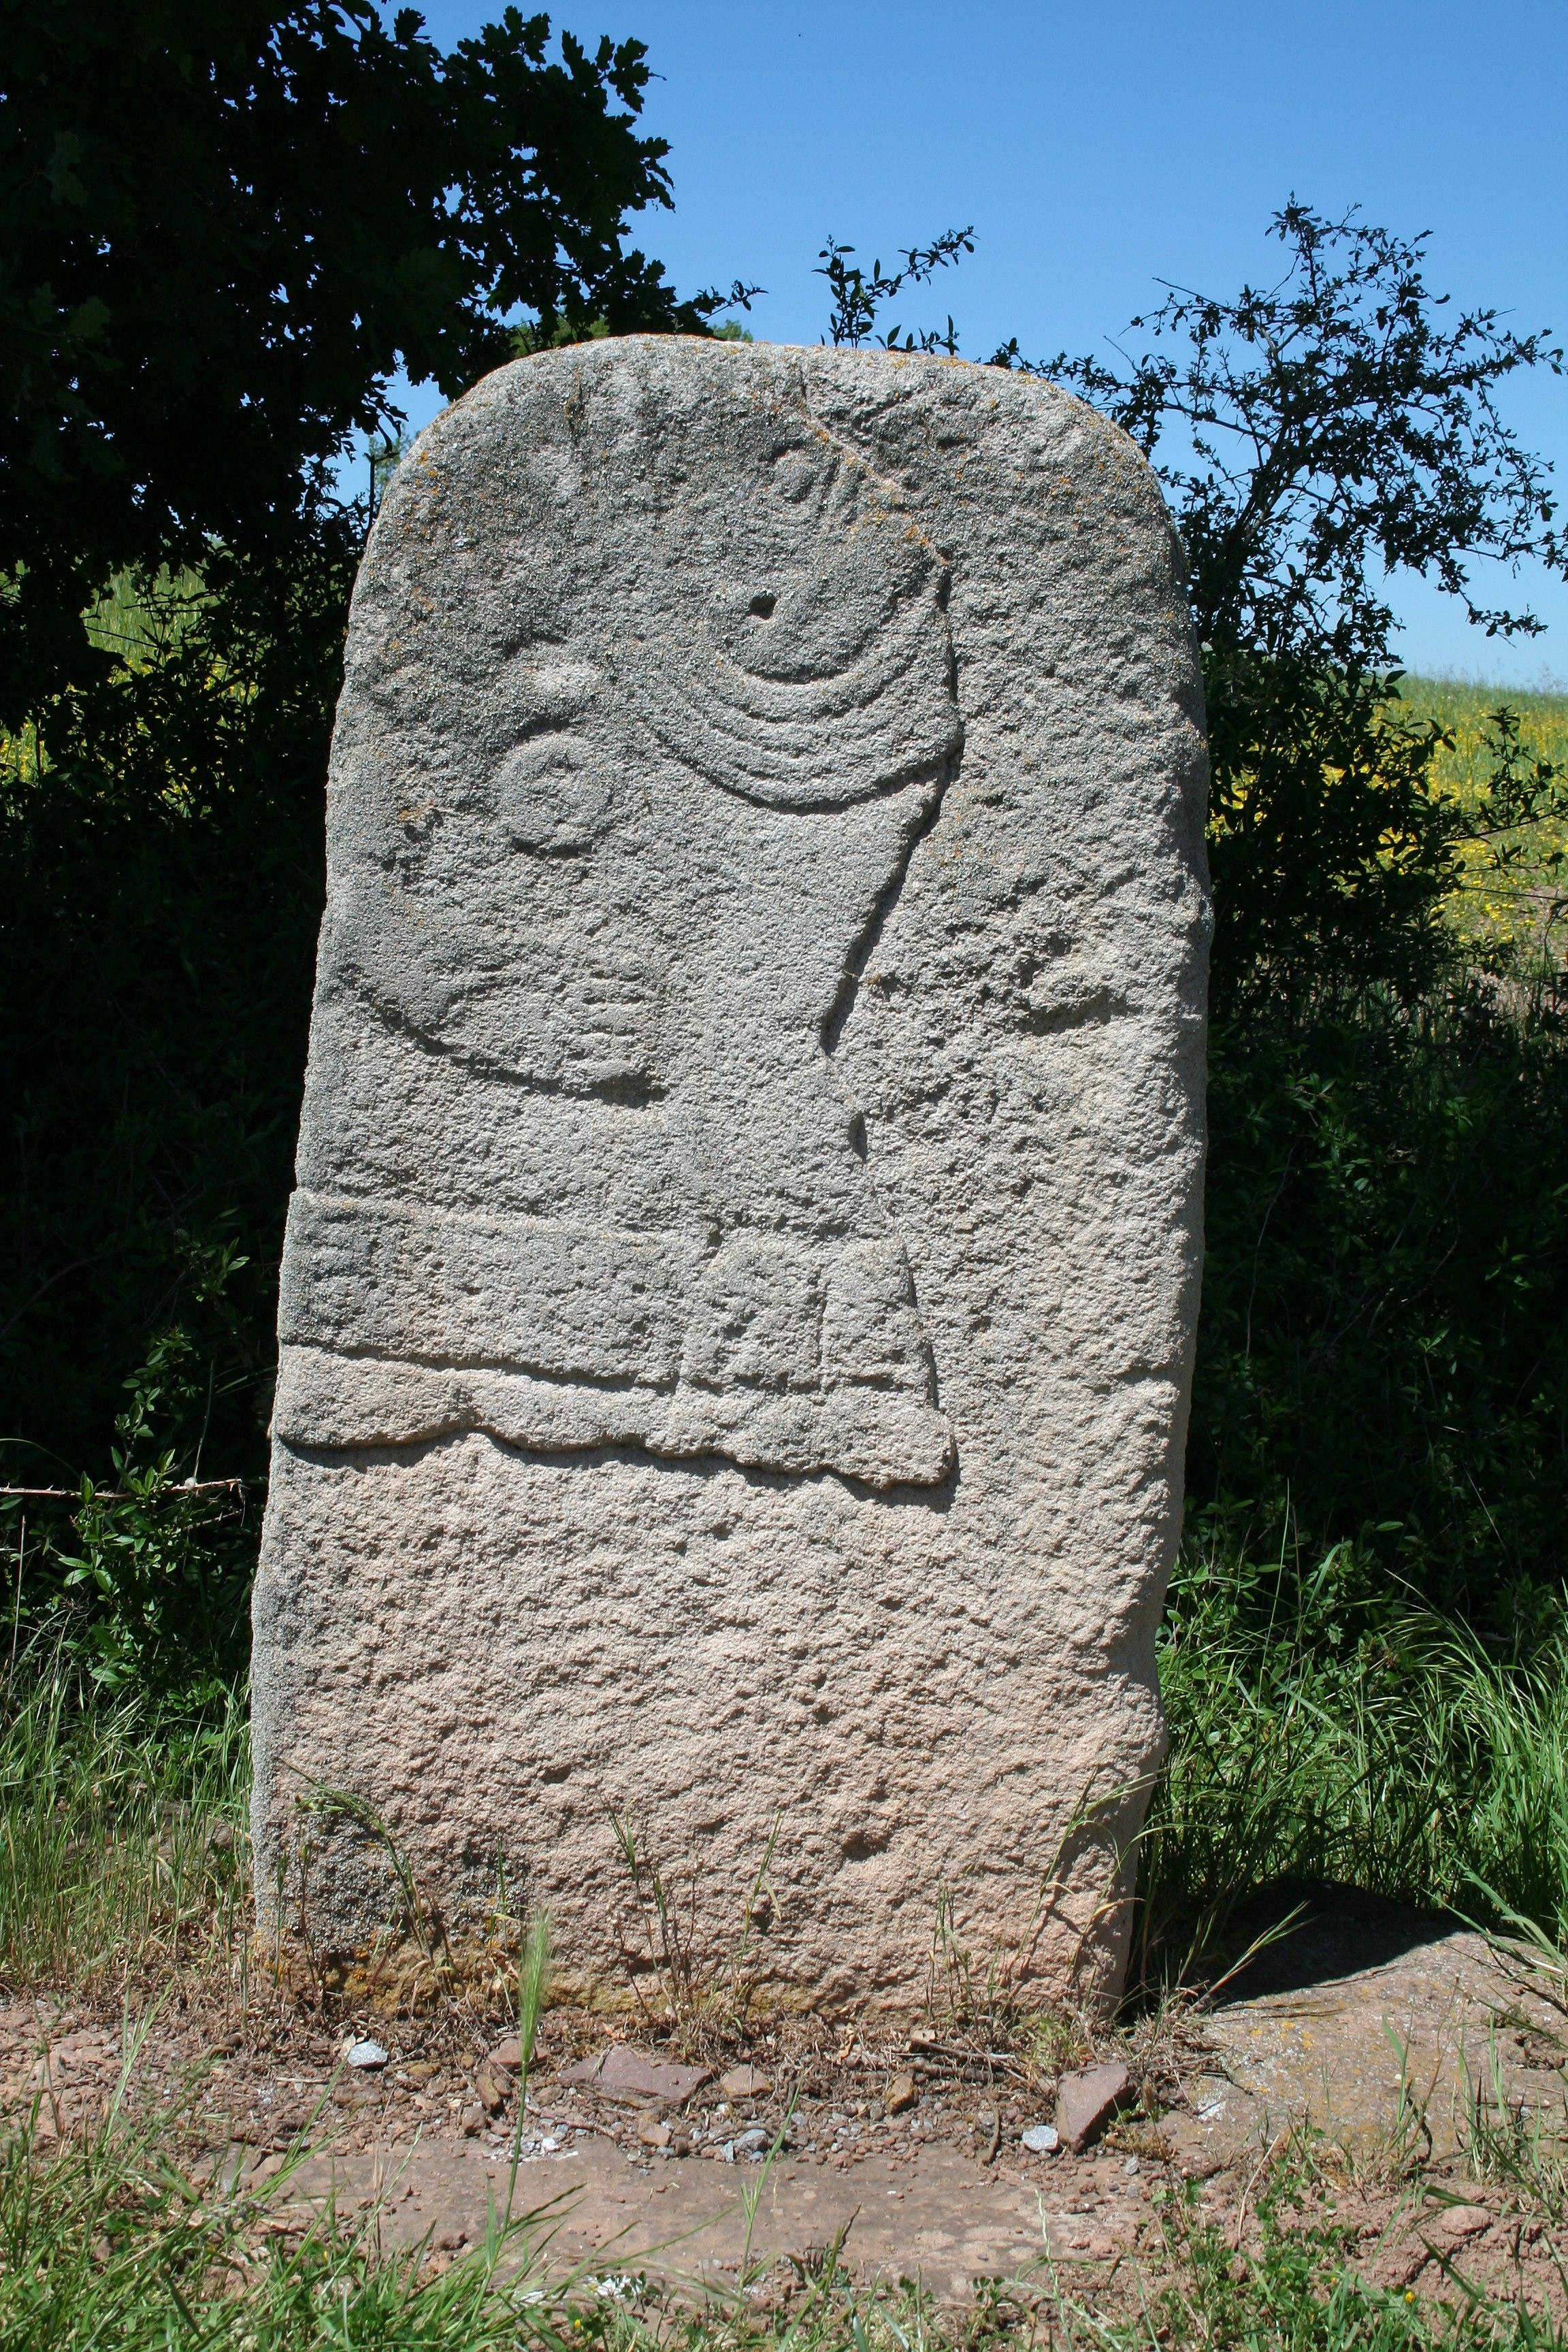 Fichier:Combret statue-menhir de Serres.JPG — Wikipédia